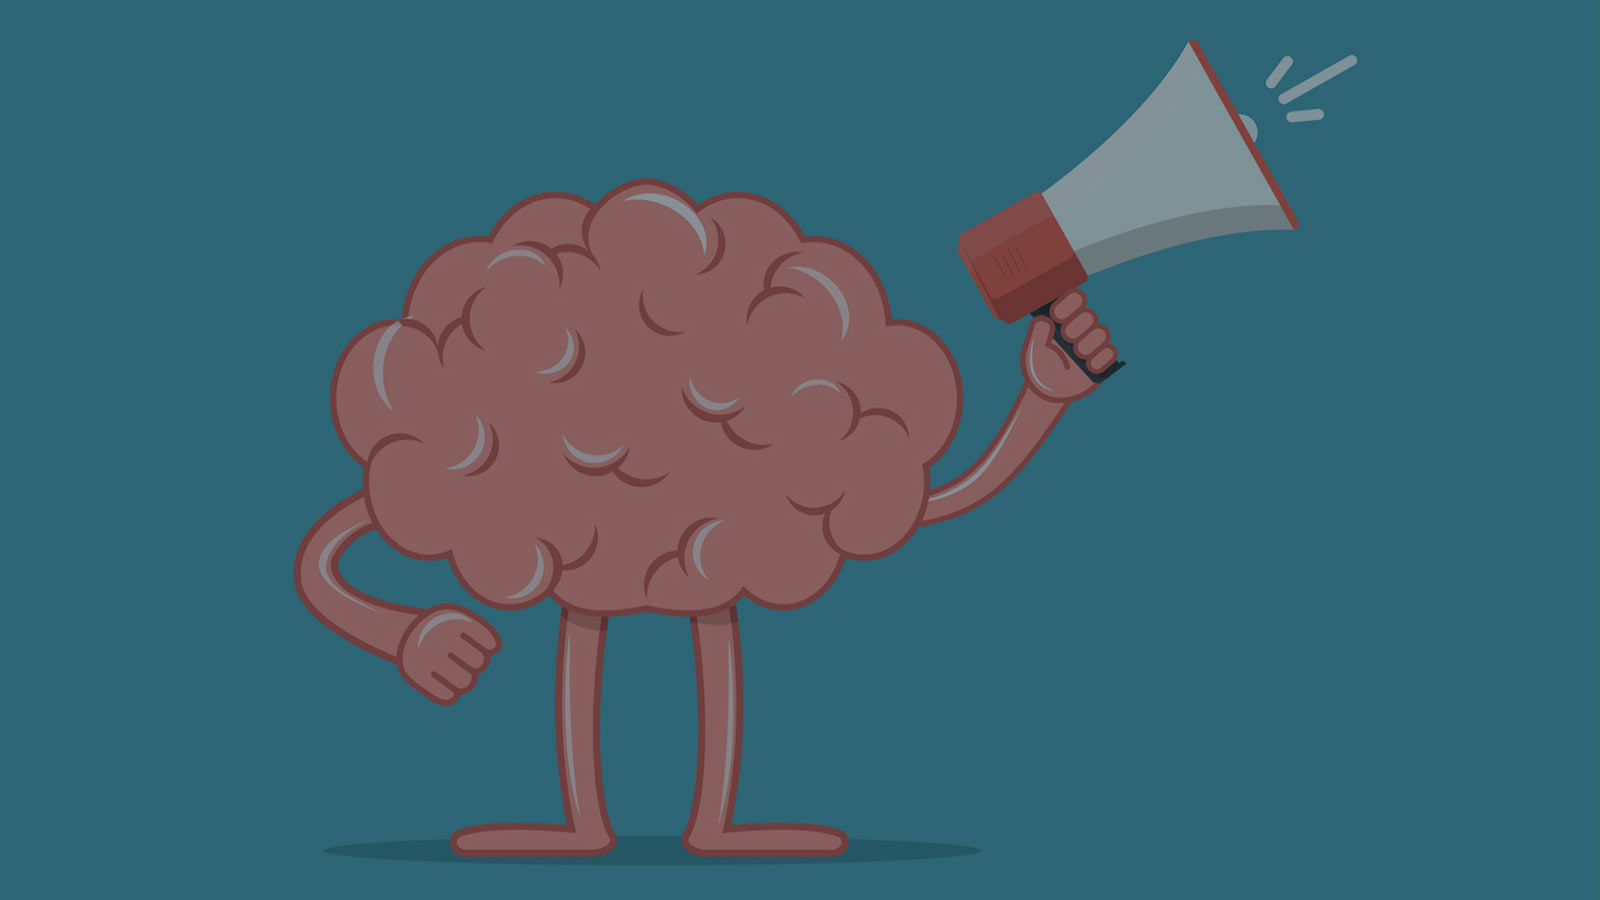 O que é neuromarketing? Saiba o que é e como usar!